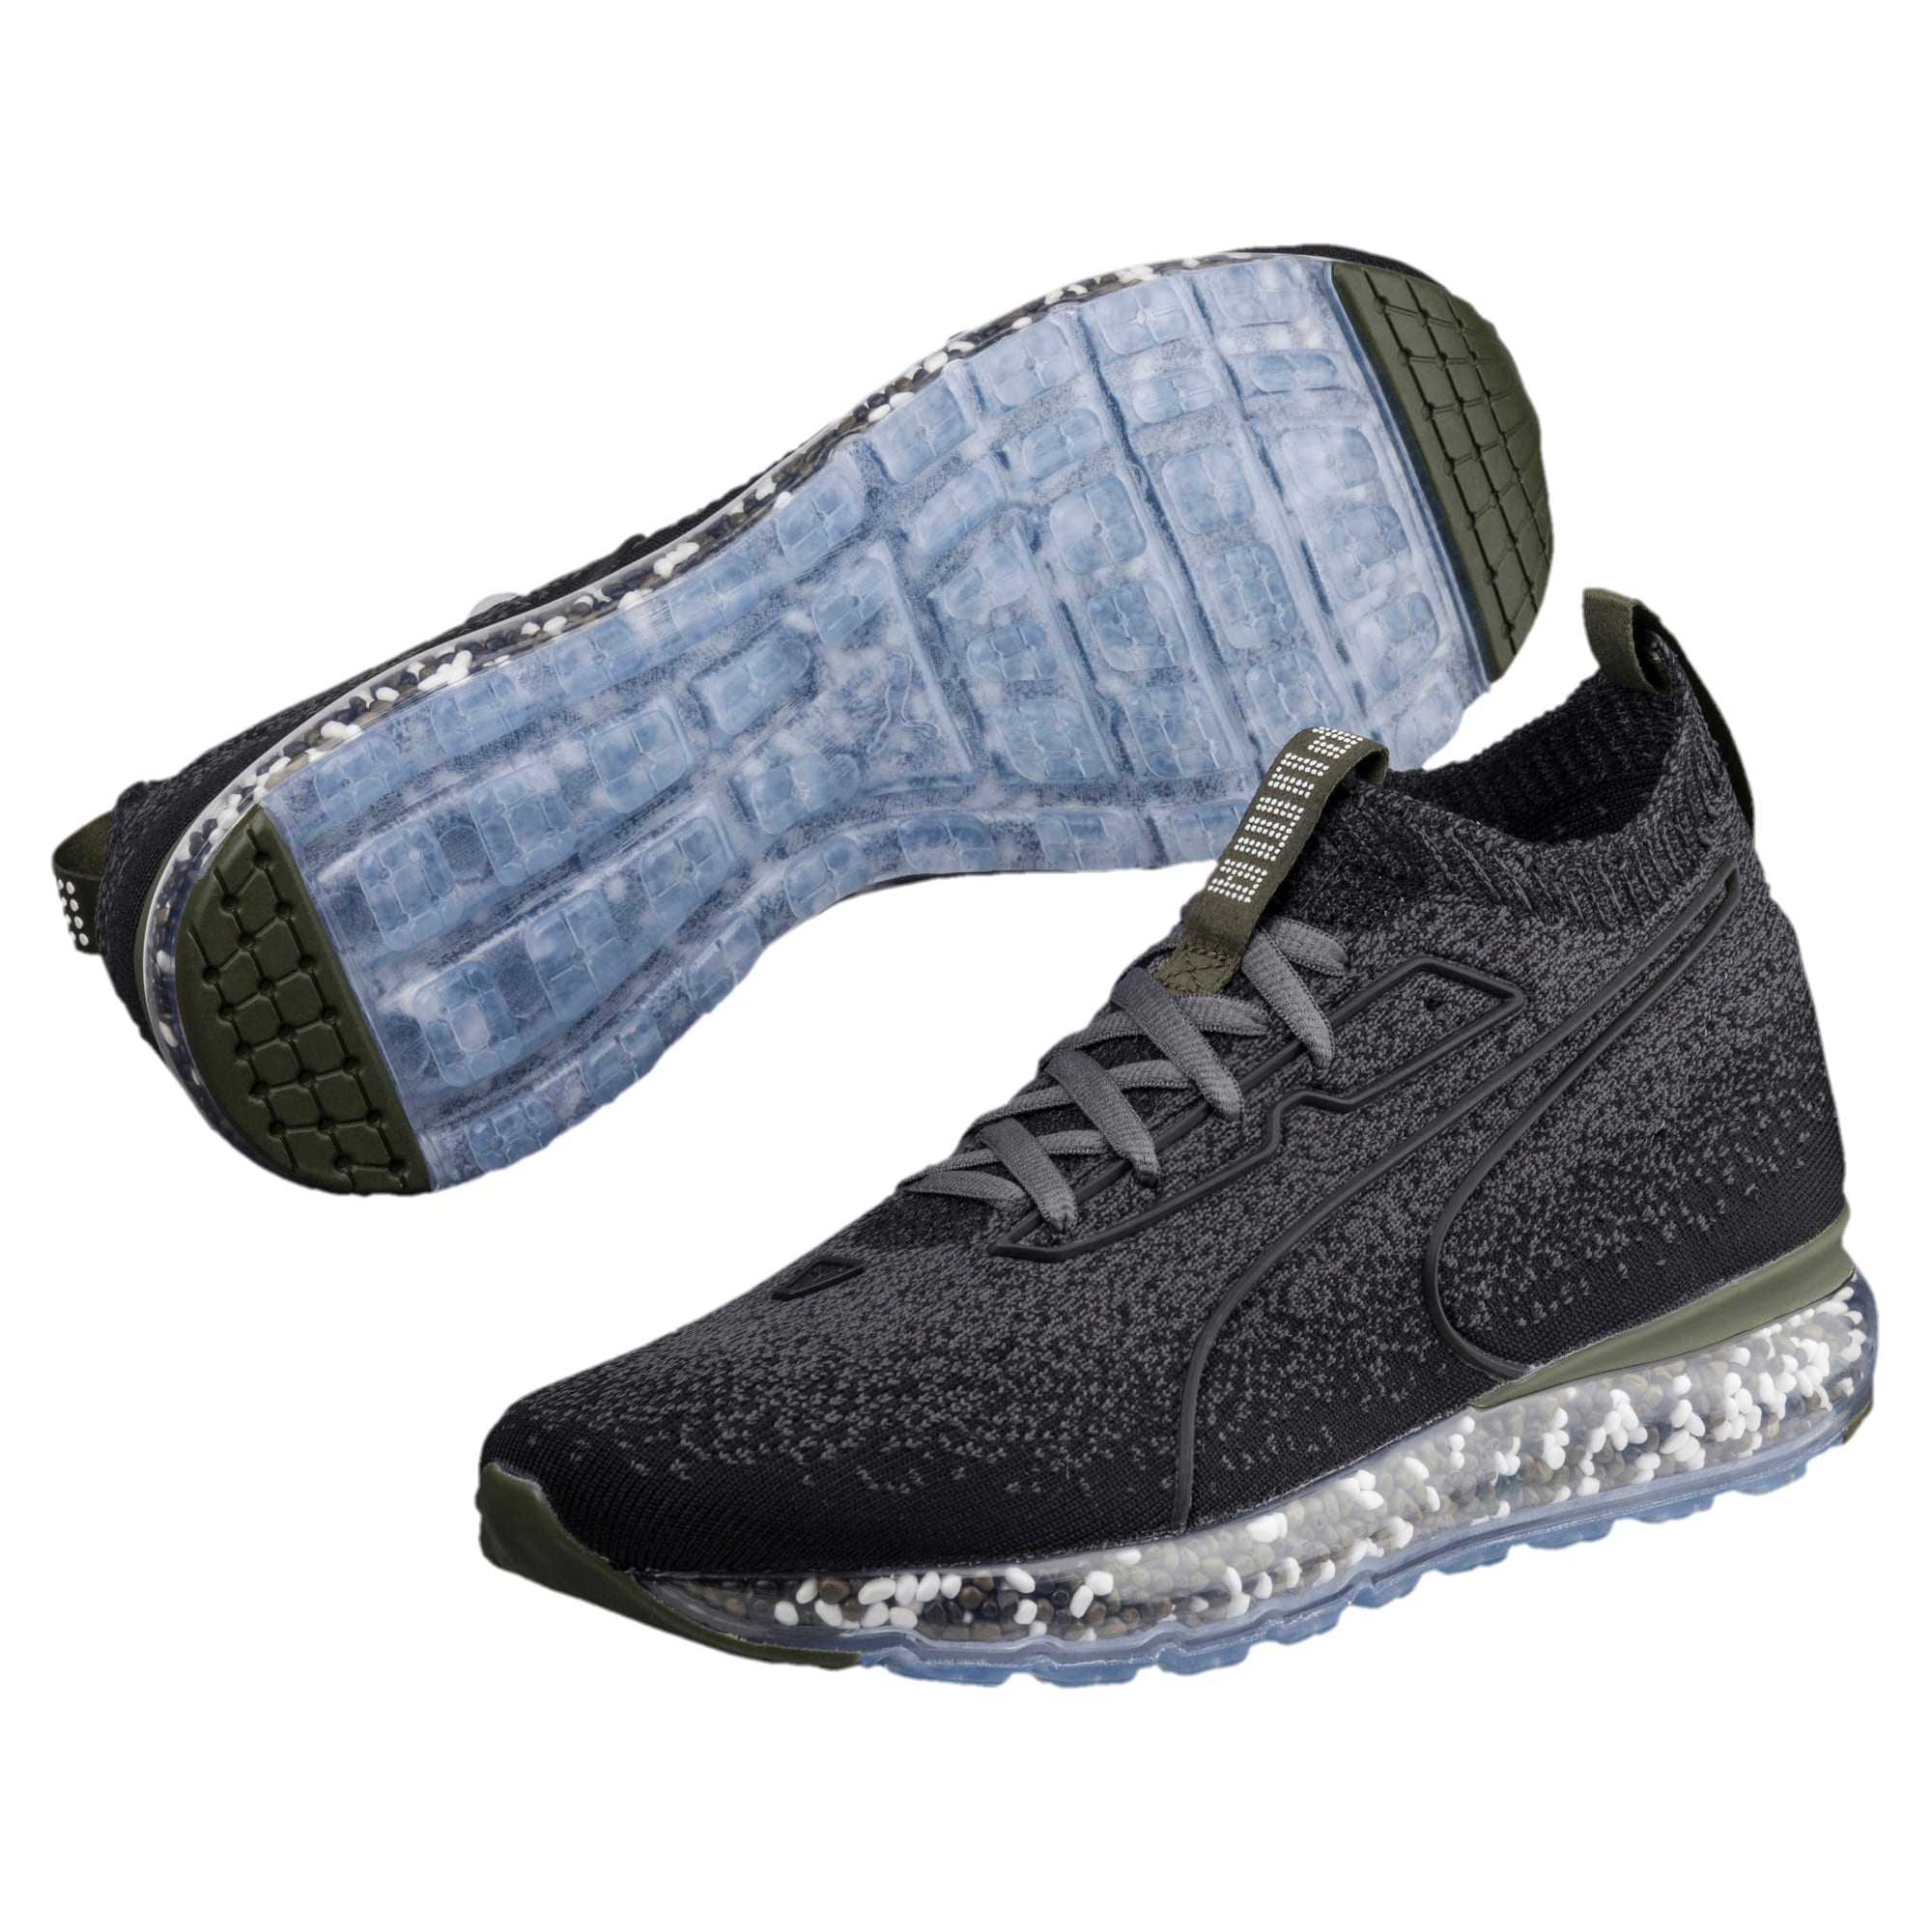 Thumbnail 2 of Jamming Women's Running Shoes, Puma Black-Forest Night, medium